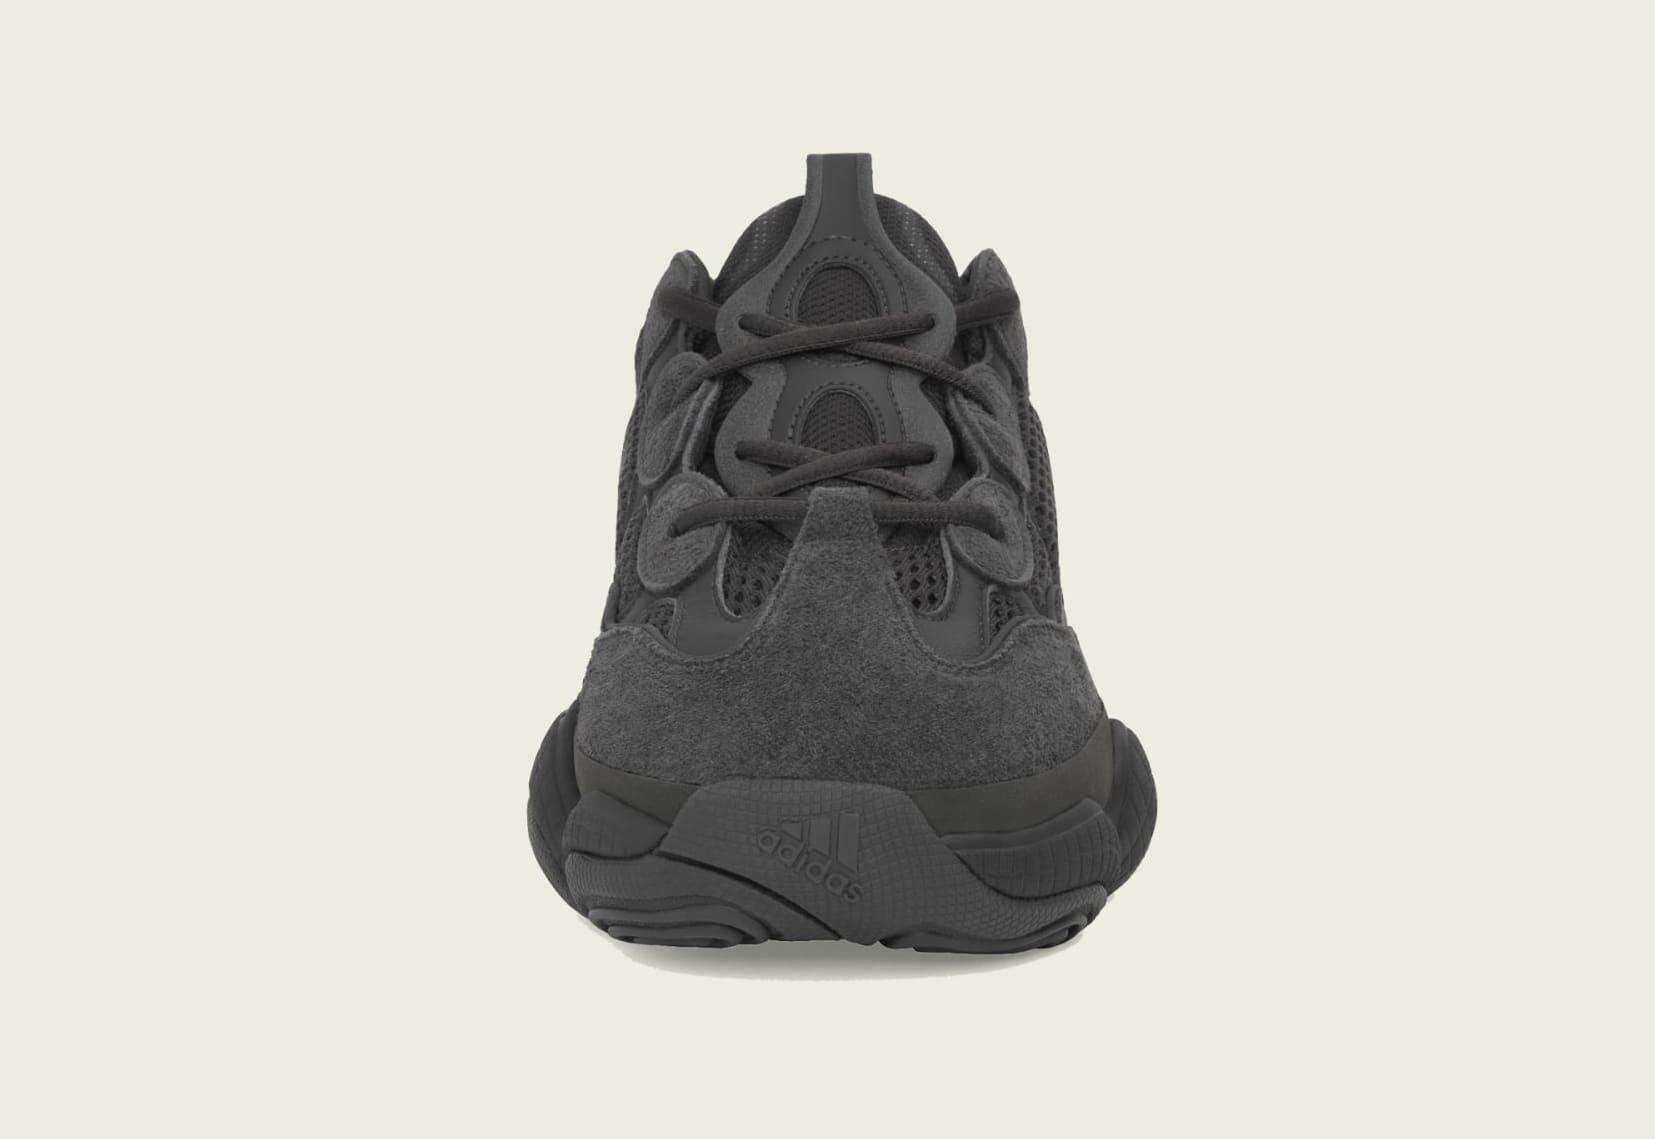 Adidas Yeezy 500 'Utility Black' F36640 Front